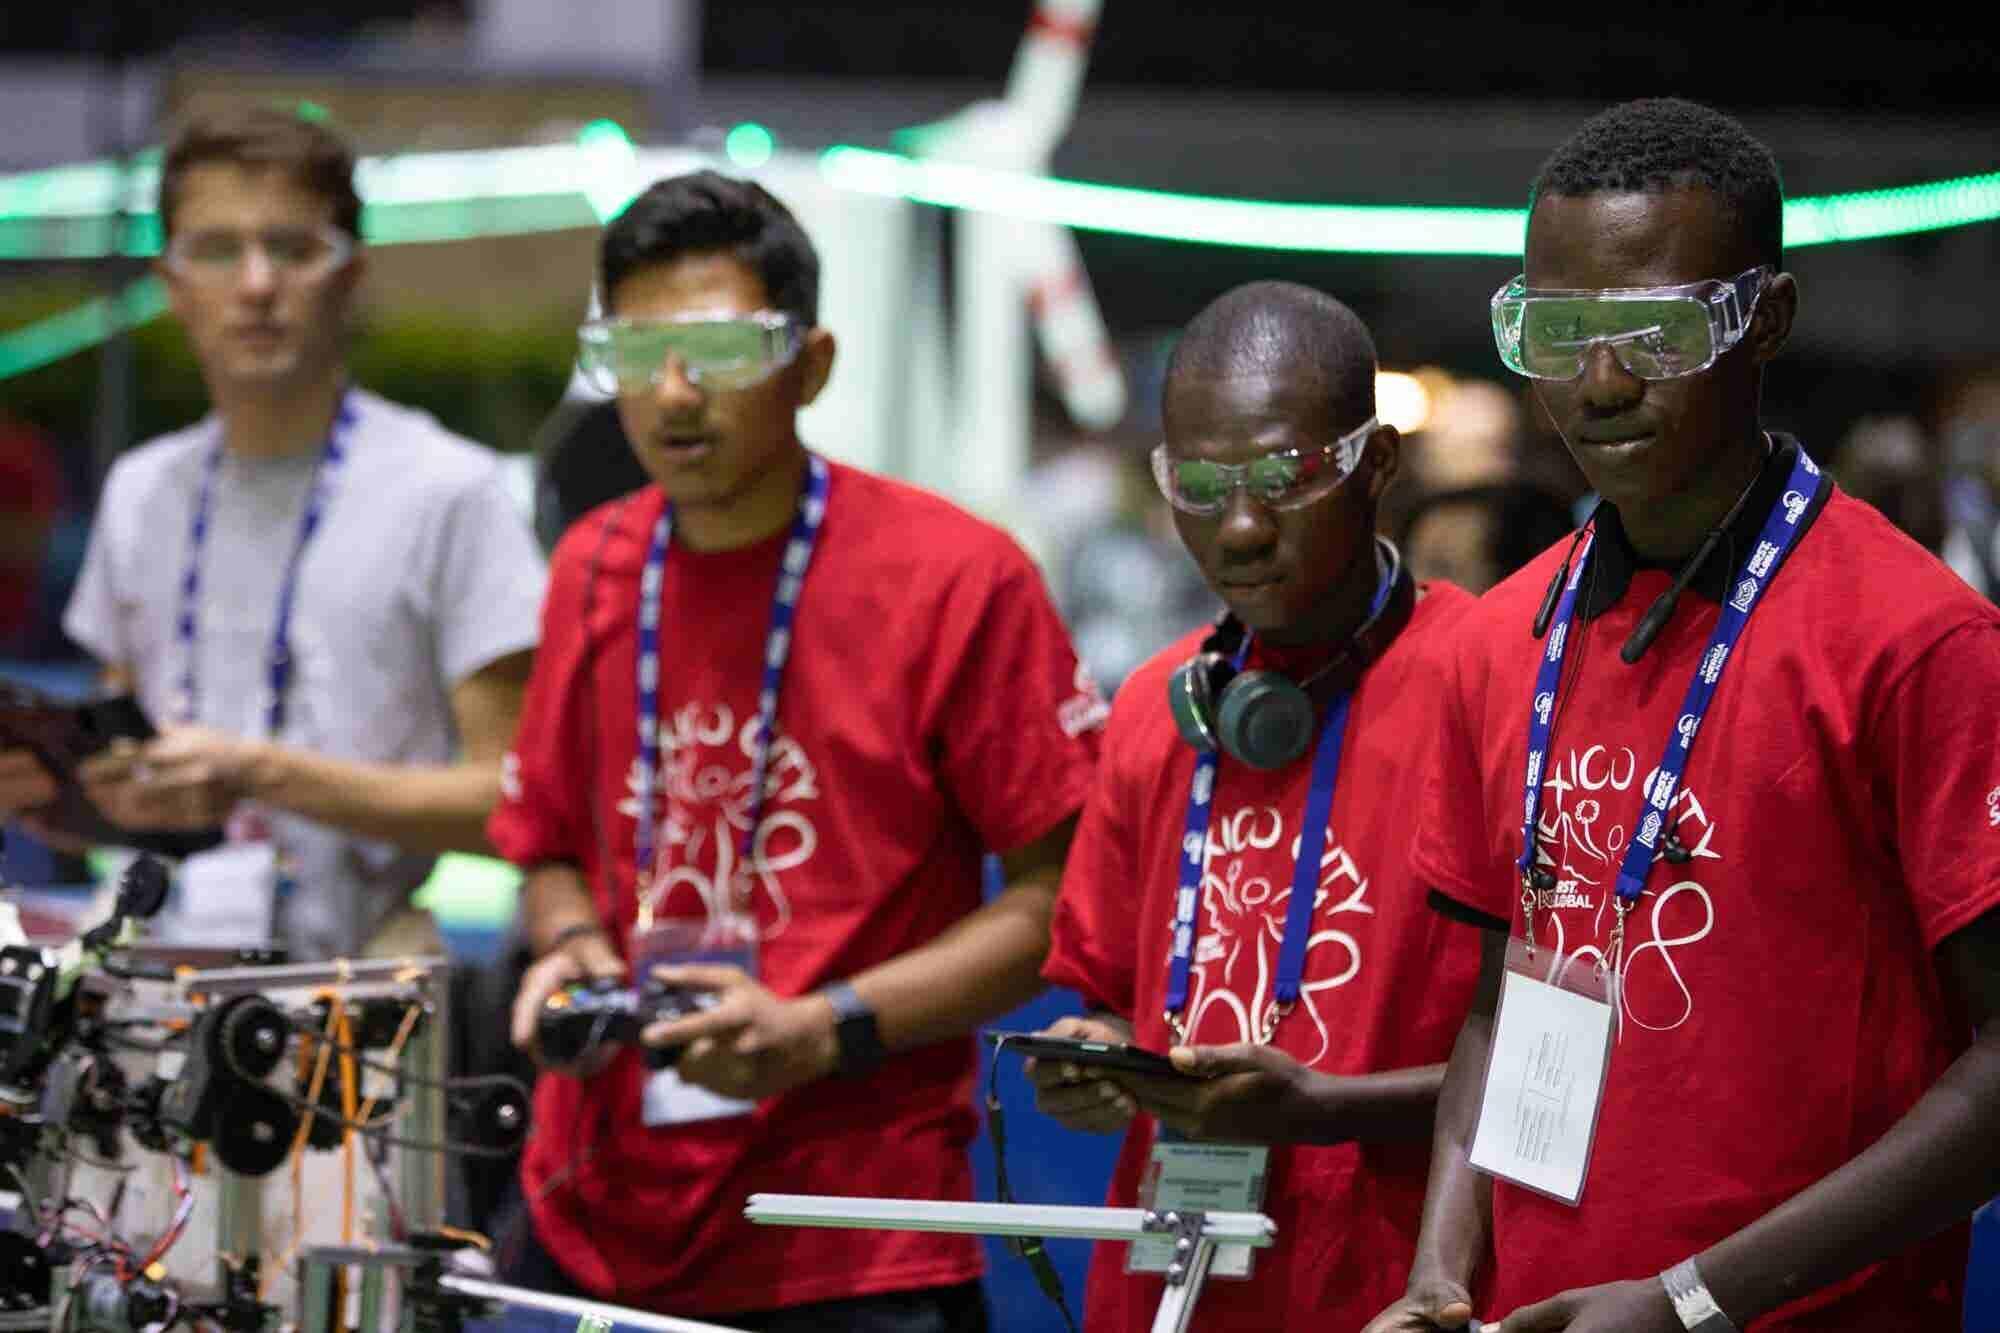 Jóvenes mexicanos ganan medalla de plata en Mundial de Robótica FIRST...